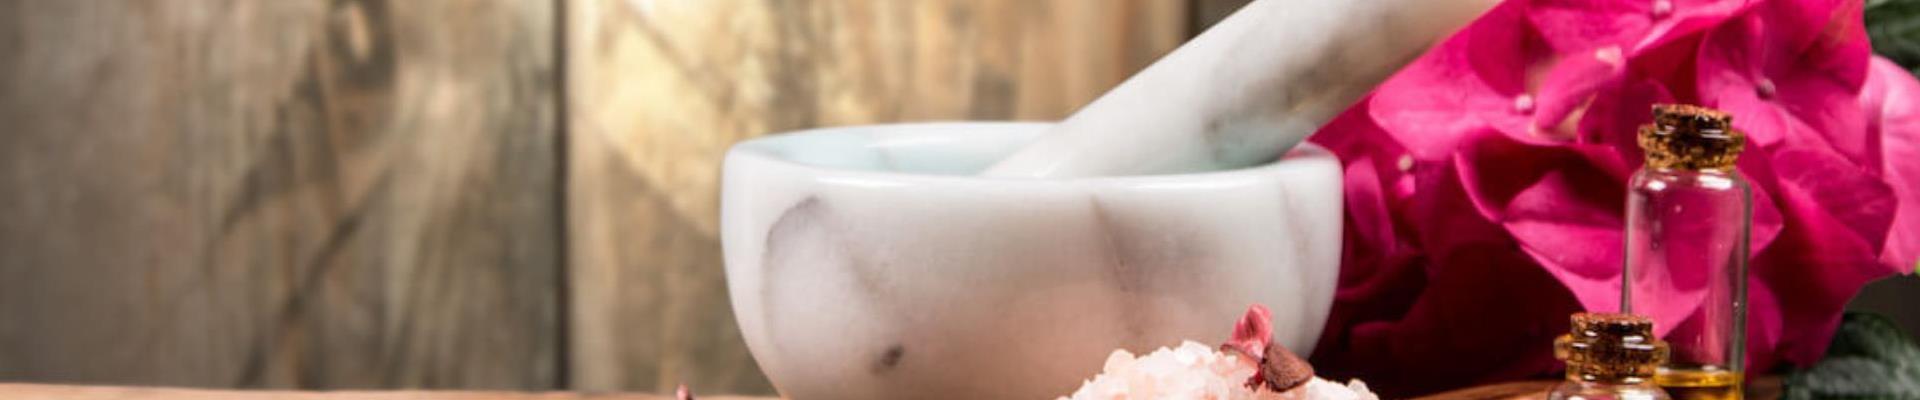 Reflexologie Massage in Antwerpen